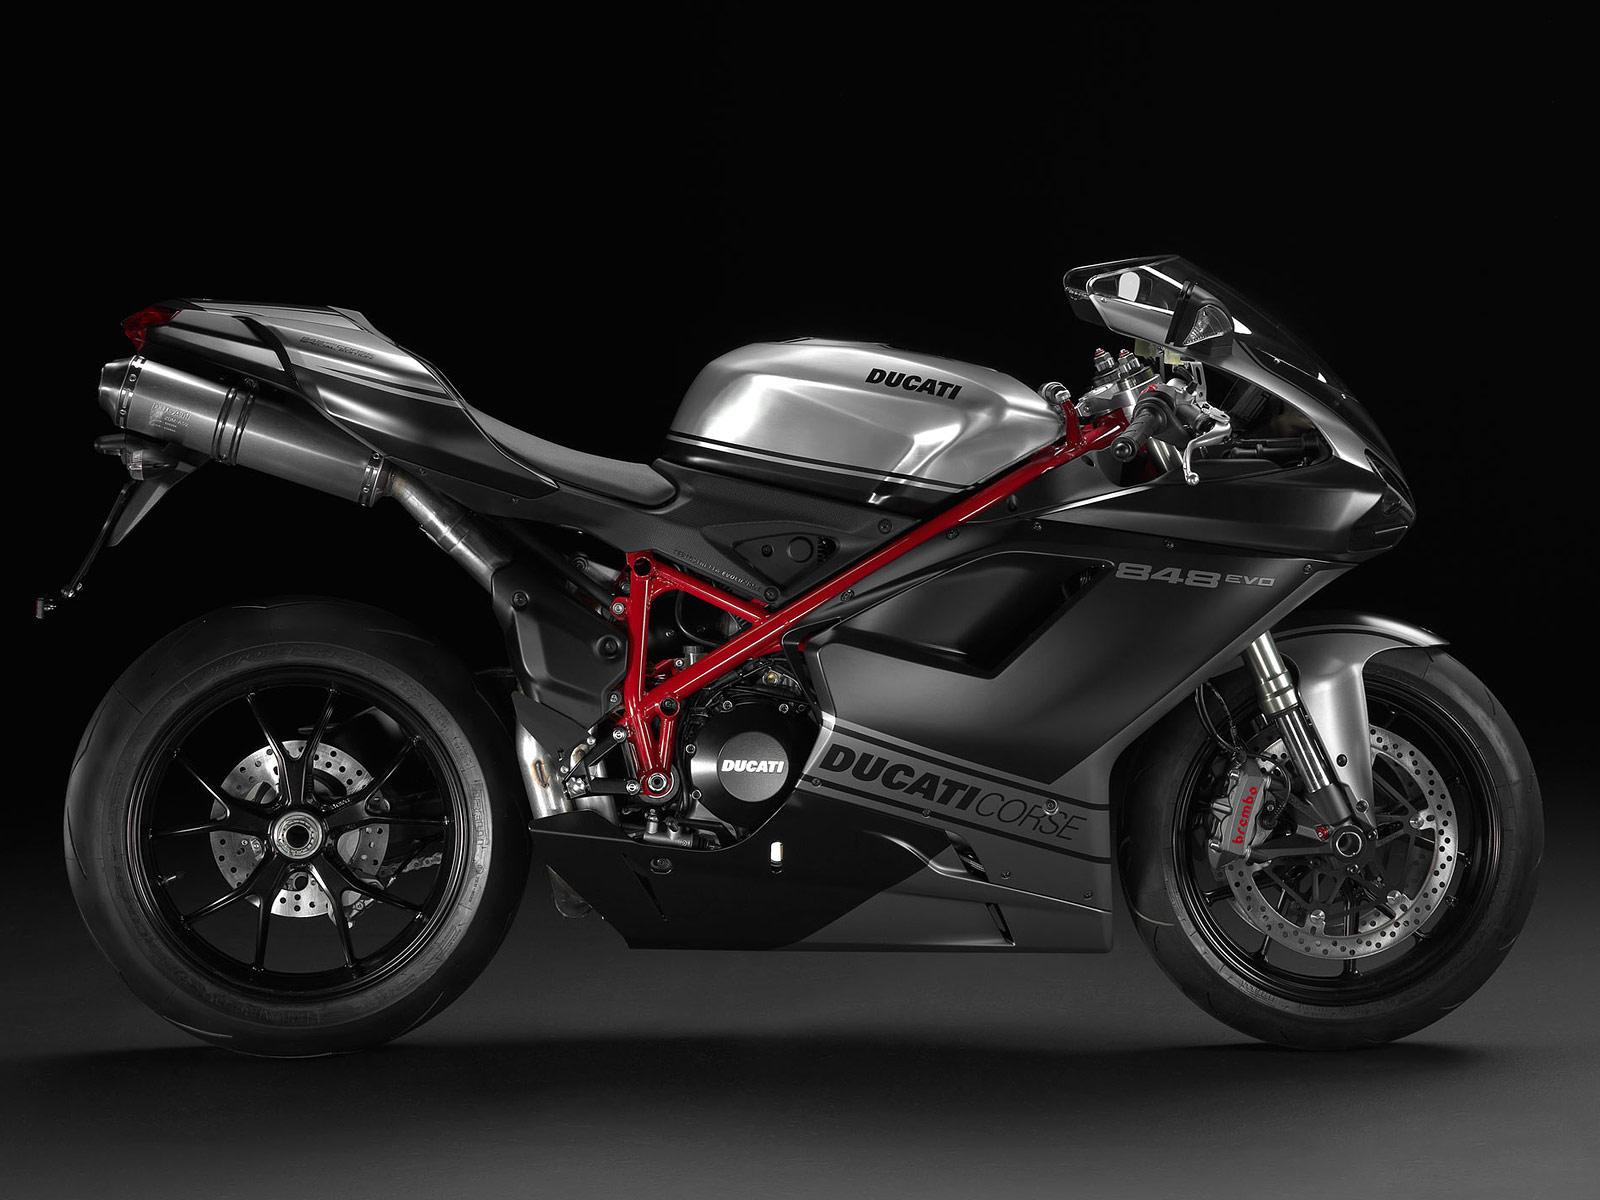 Superbike 848 EVO Corse SE 2013 Ducati Photos